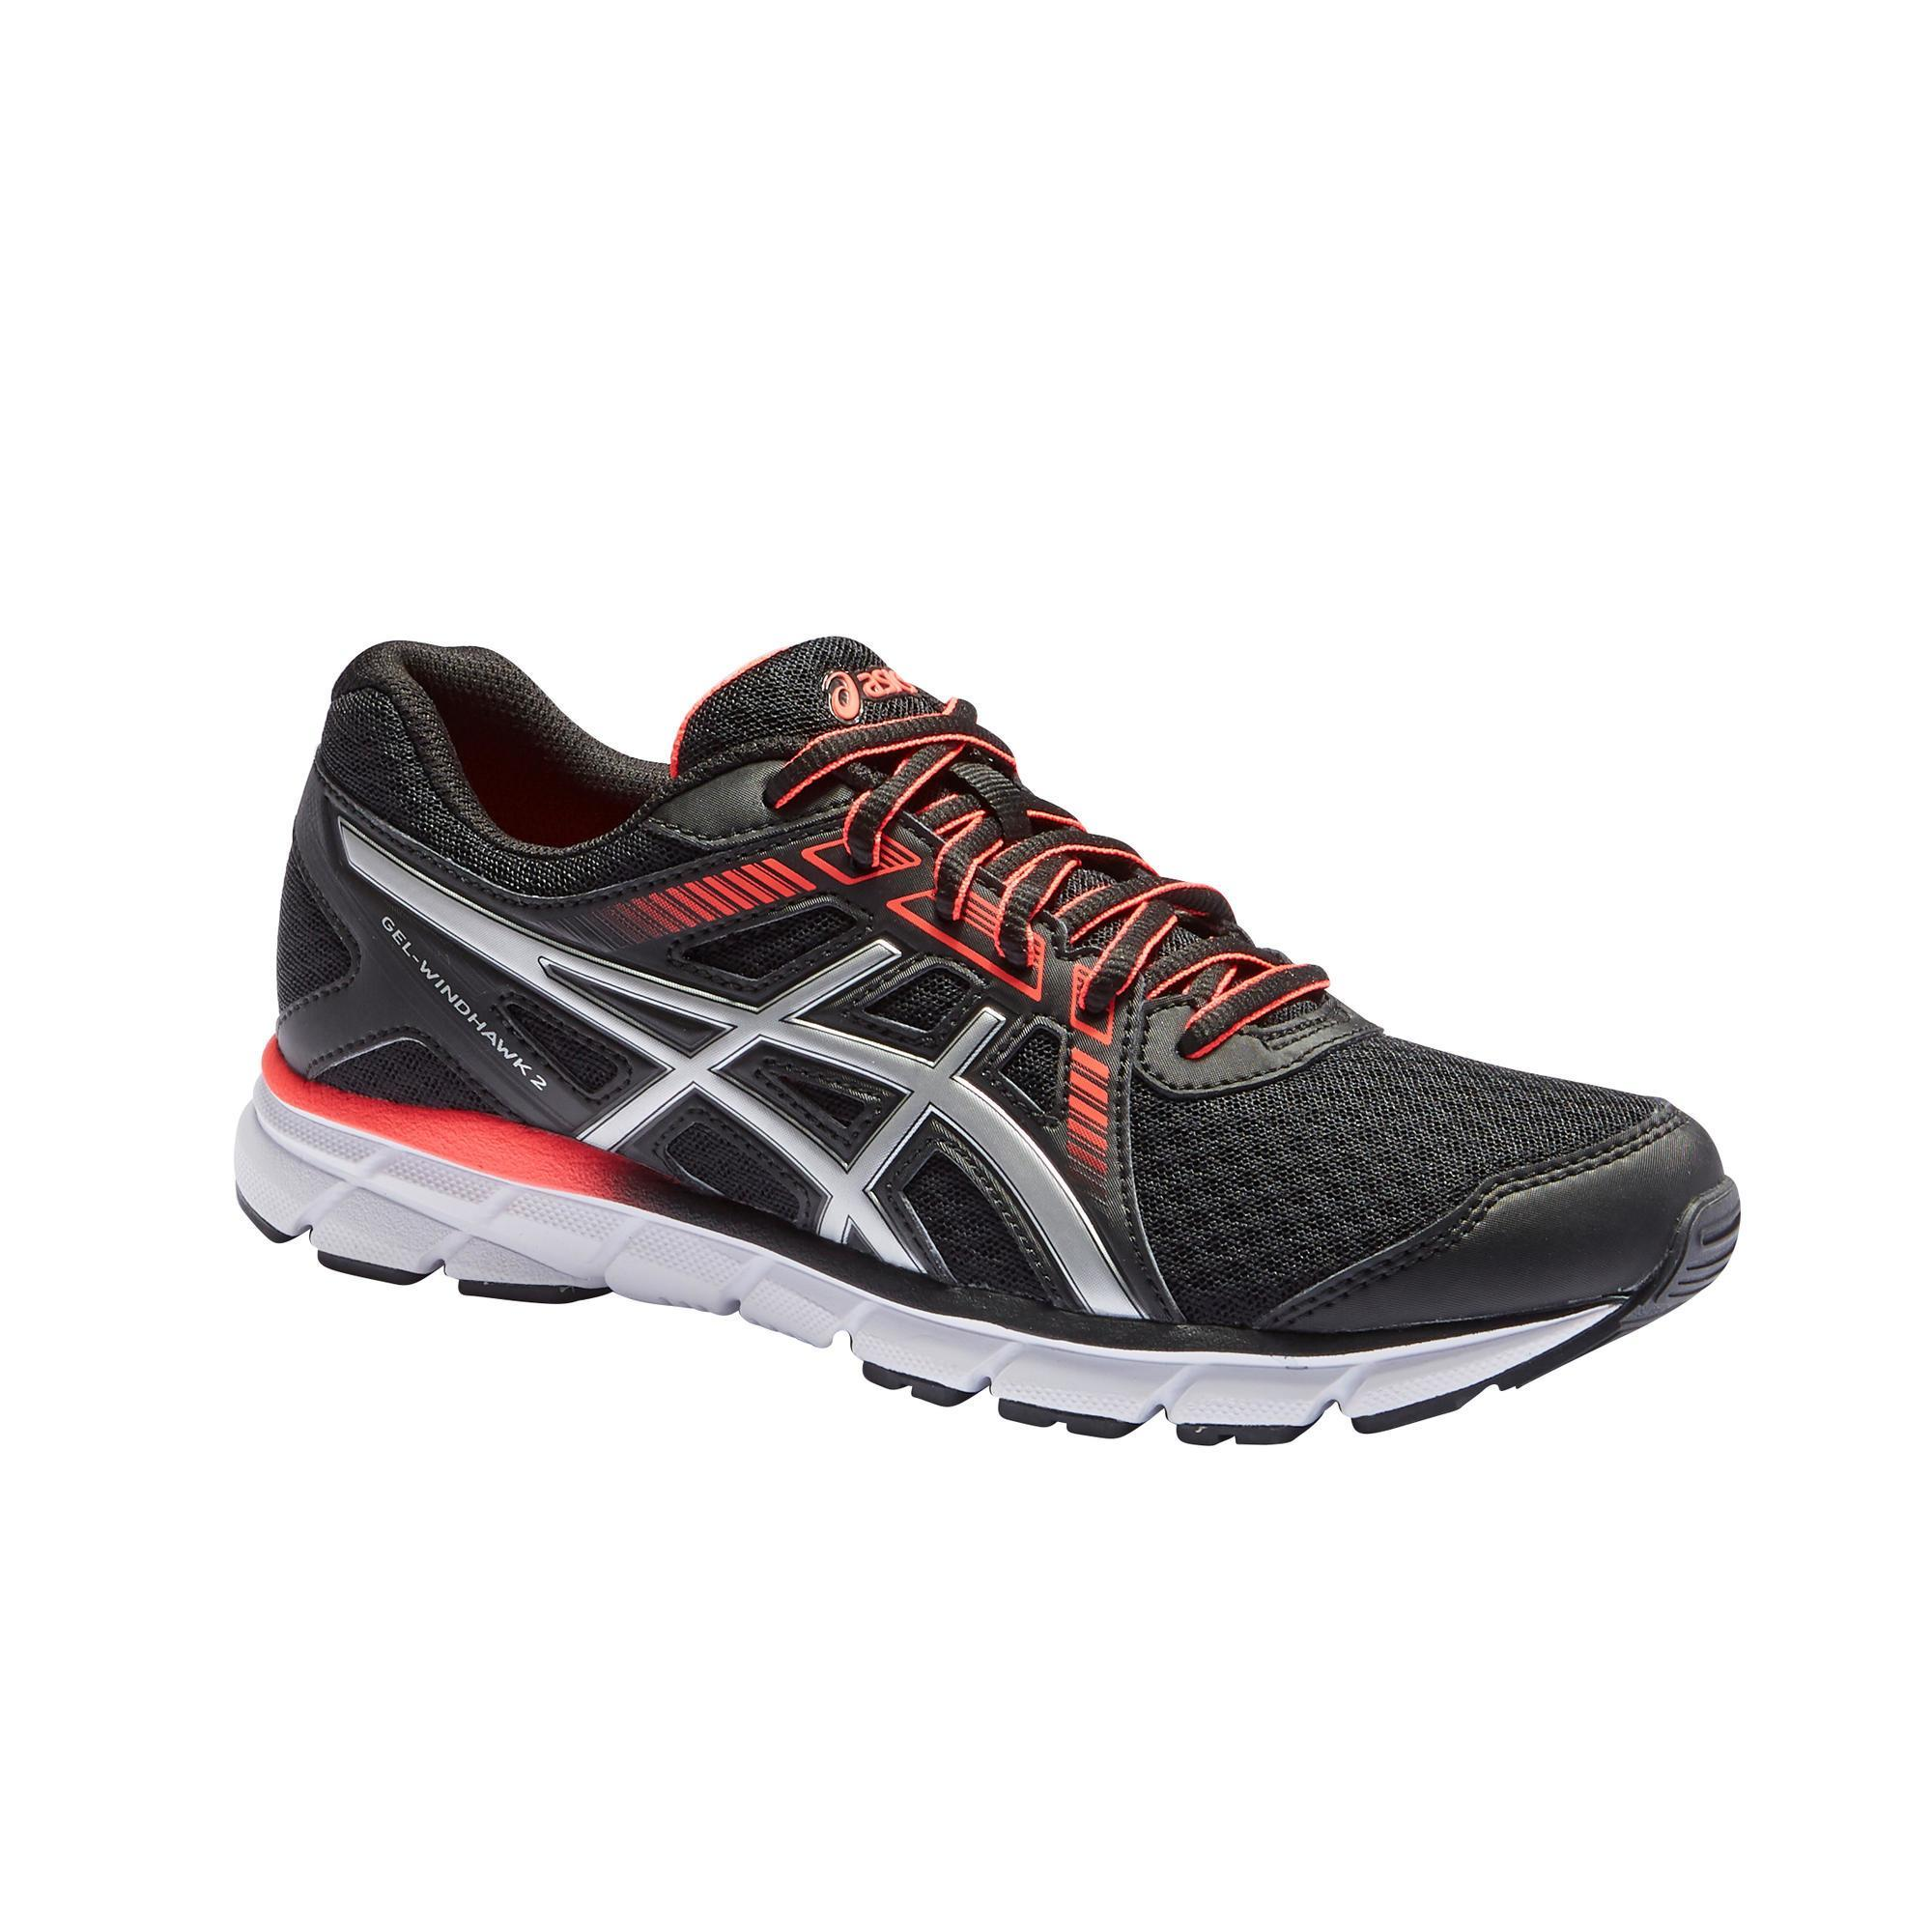 779c62261cb Comprar zapatillas de running online